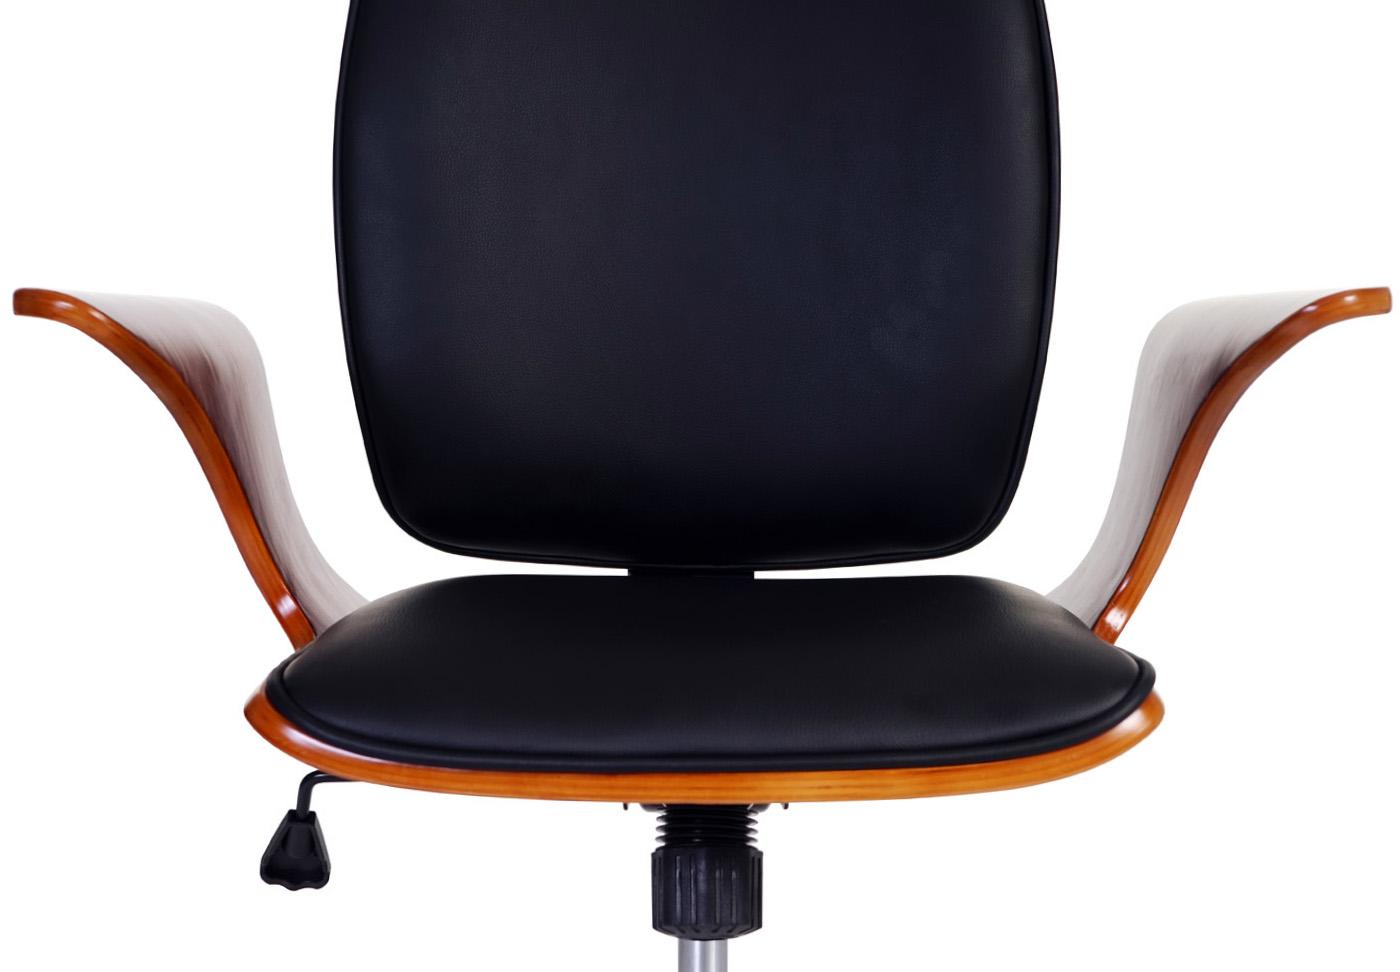 Bugholz Kunstleder schwarz Chefsessel Drehstuhl Bürostuhl Alta